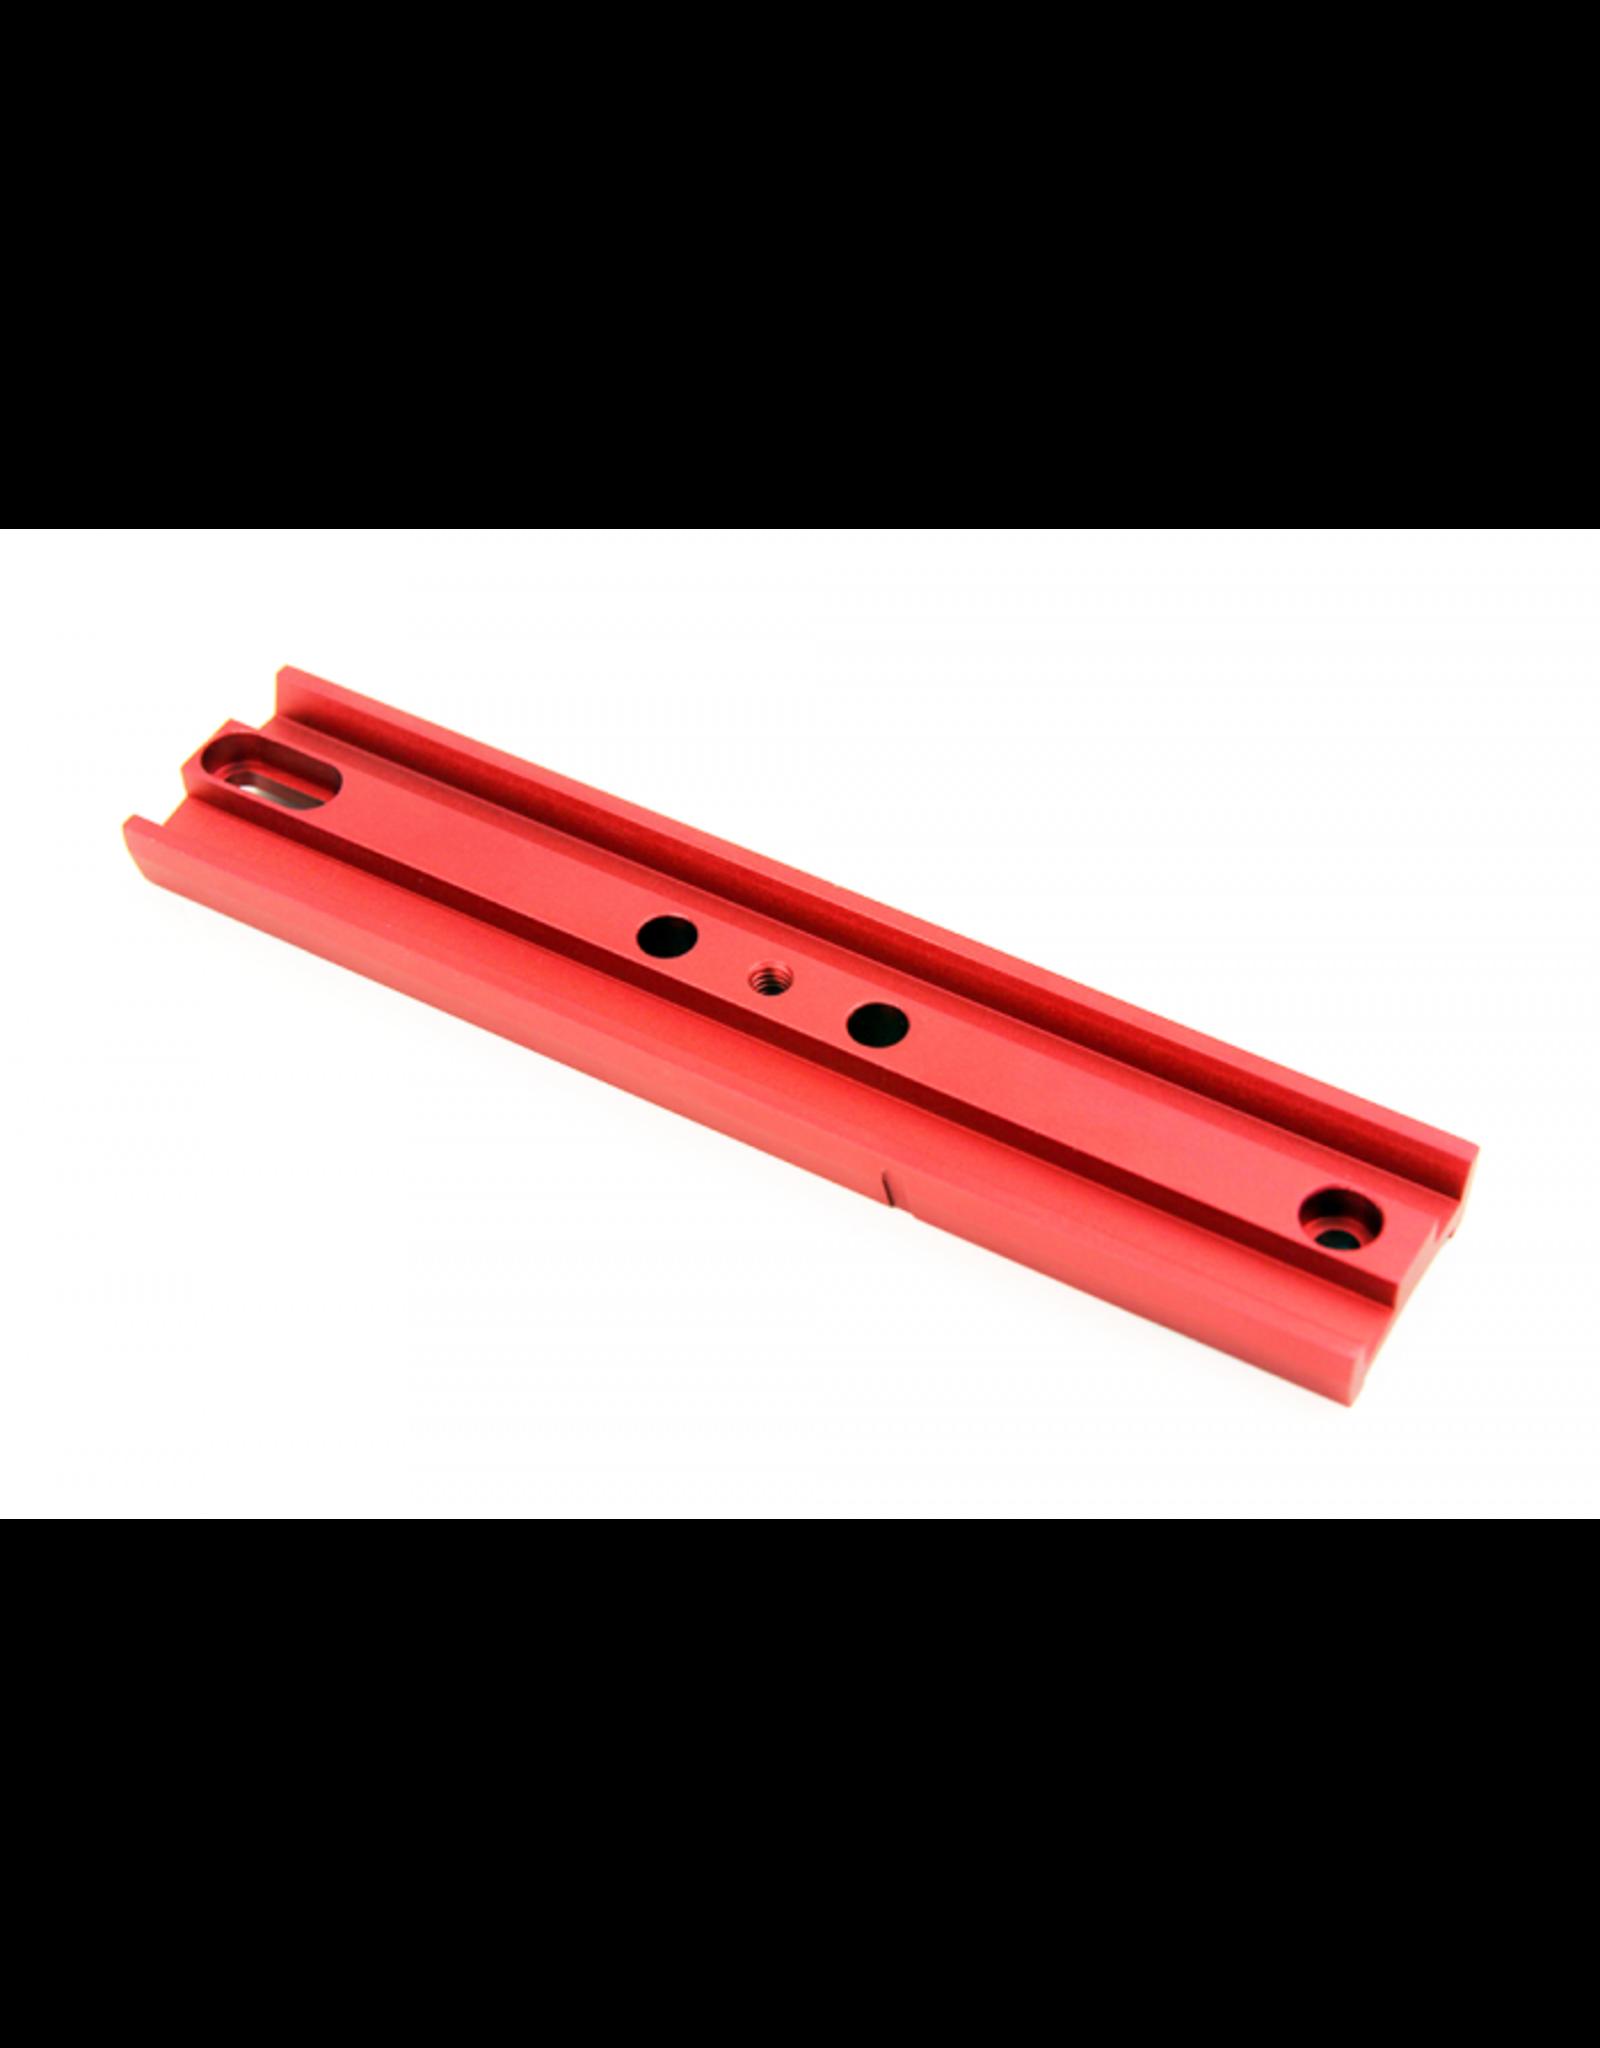 William Optics William Optics Vixen-Style 8 inch Dovetail Plate – (Specify Red or Black)